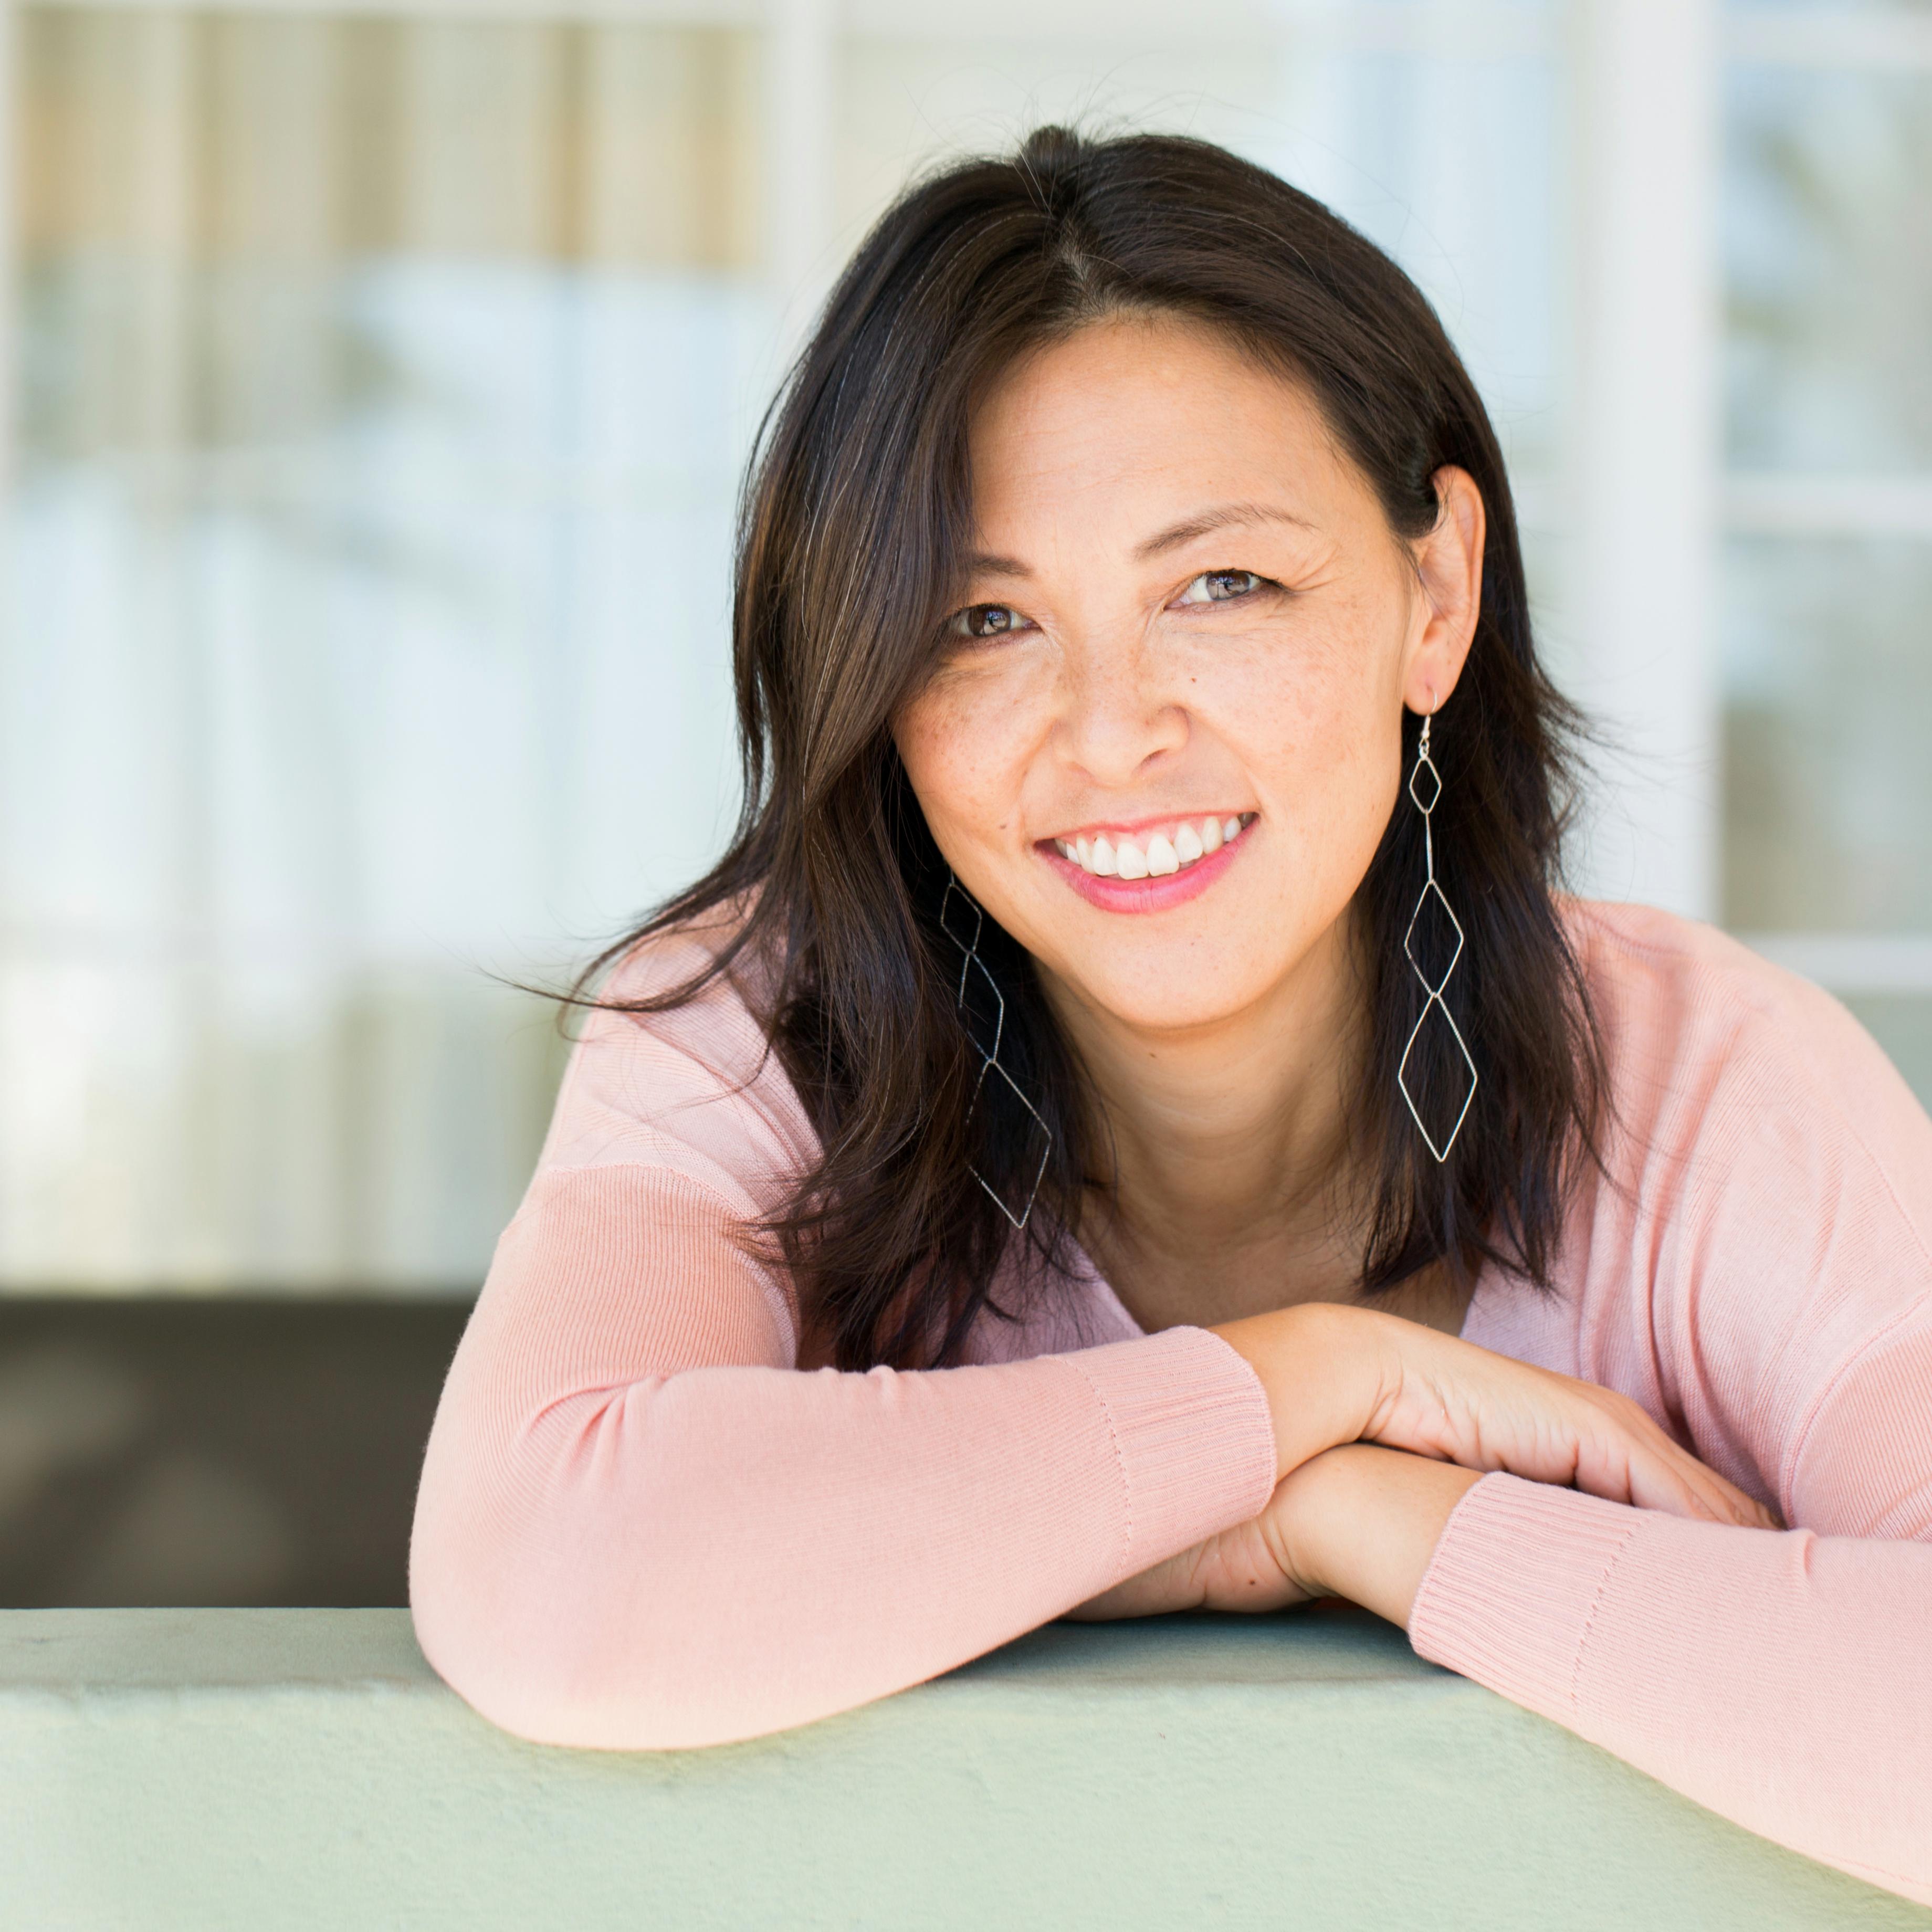 Portrait of middle-age woman